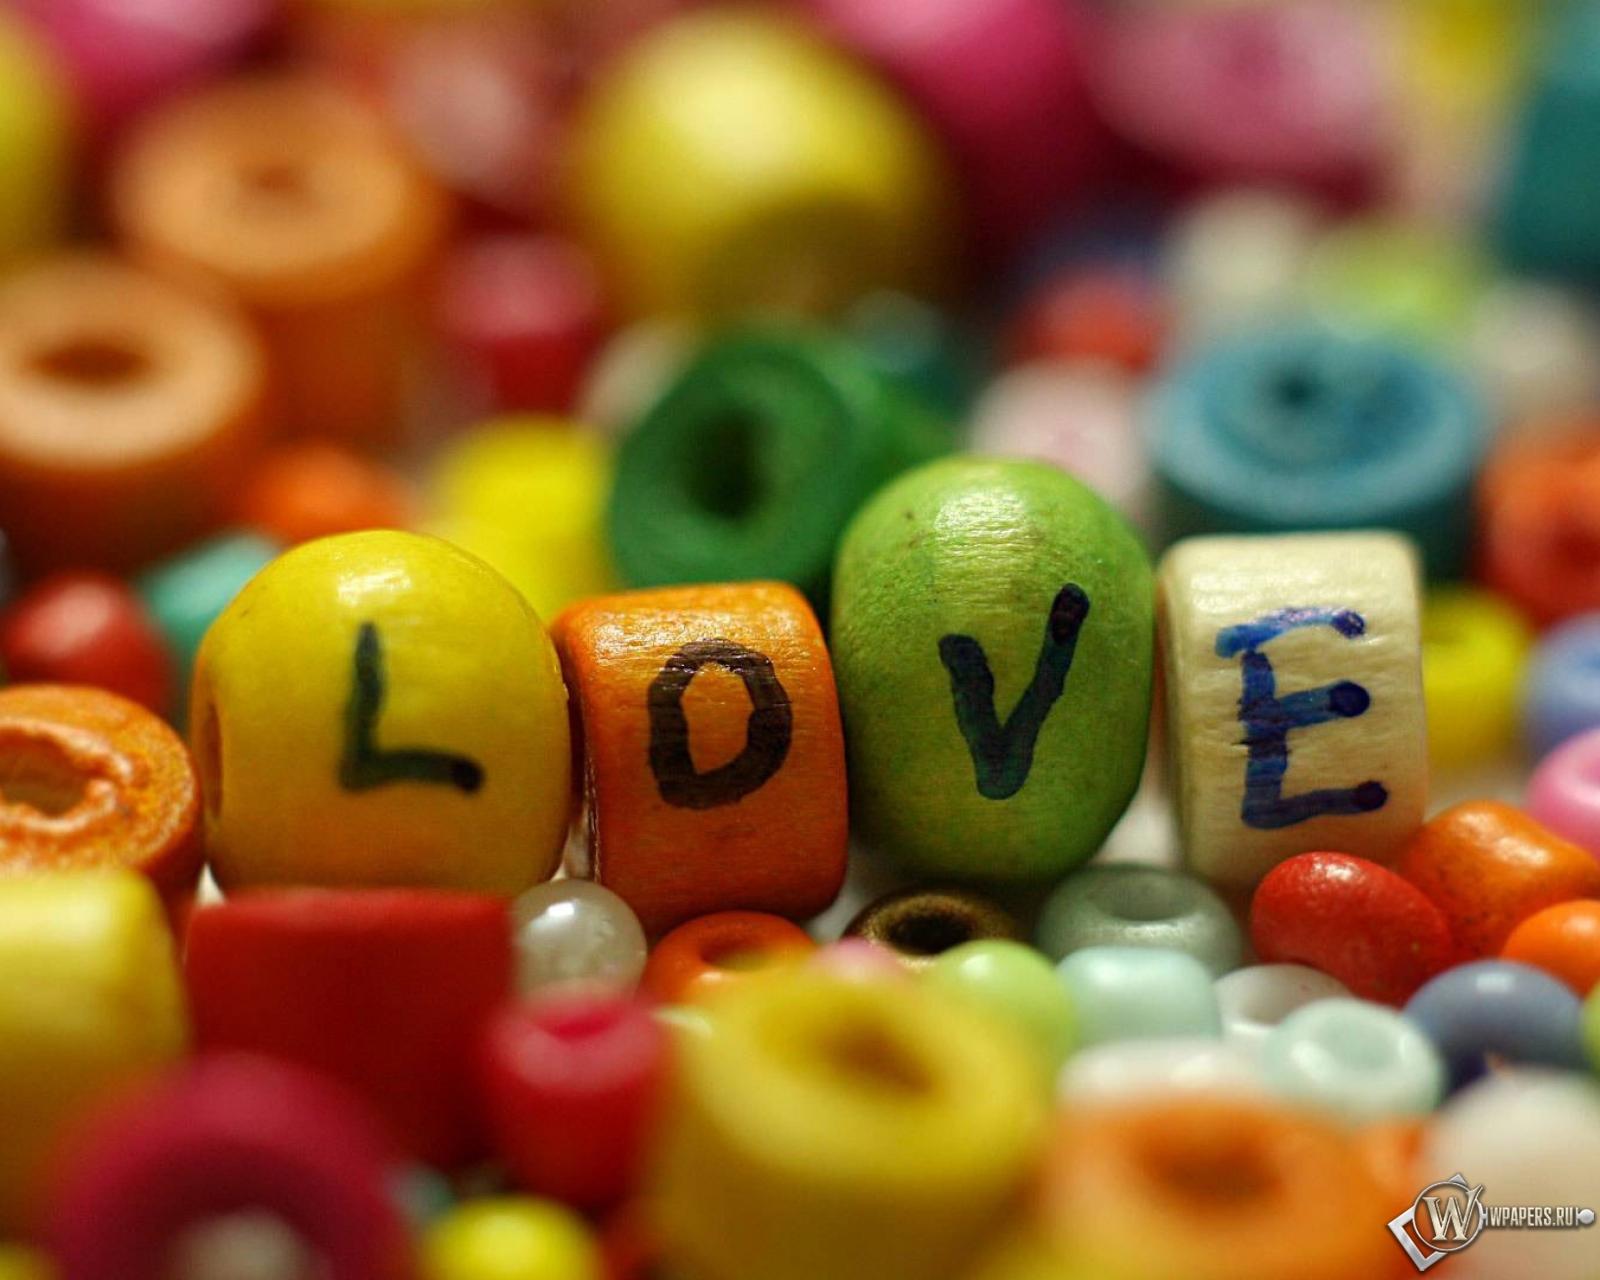 Любовь 1600x1280